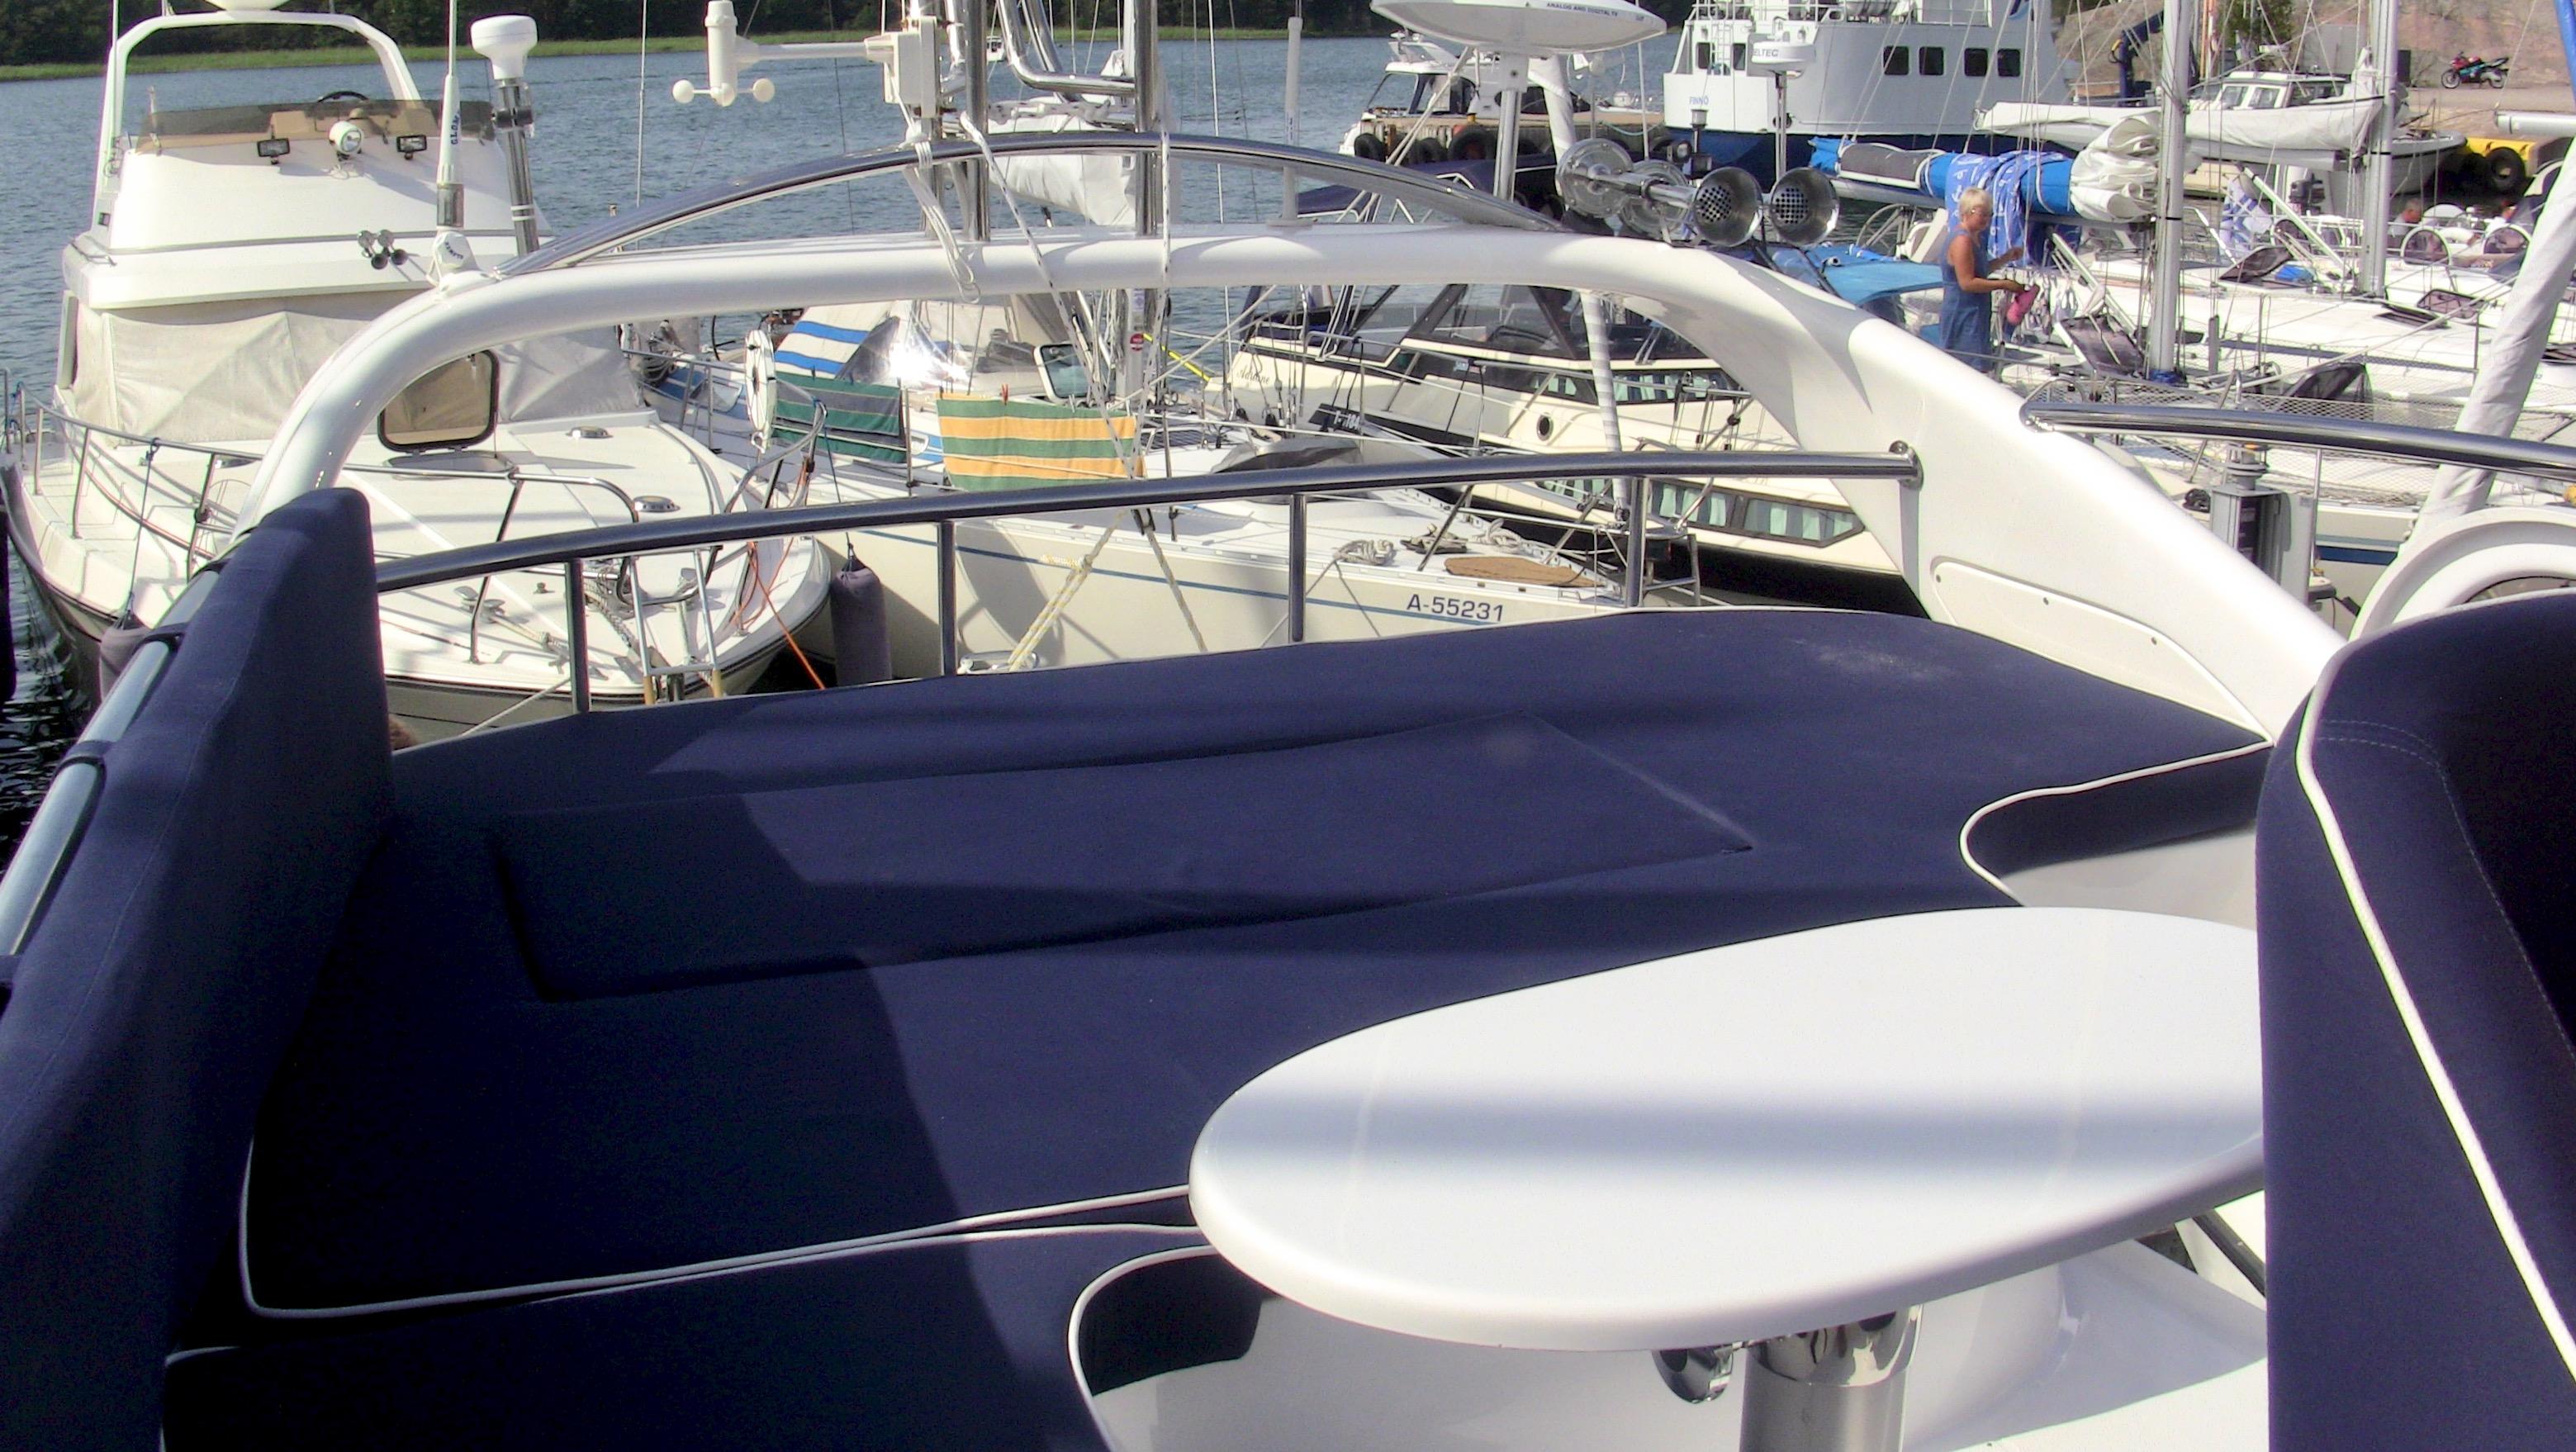 Suwena's sun deck